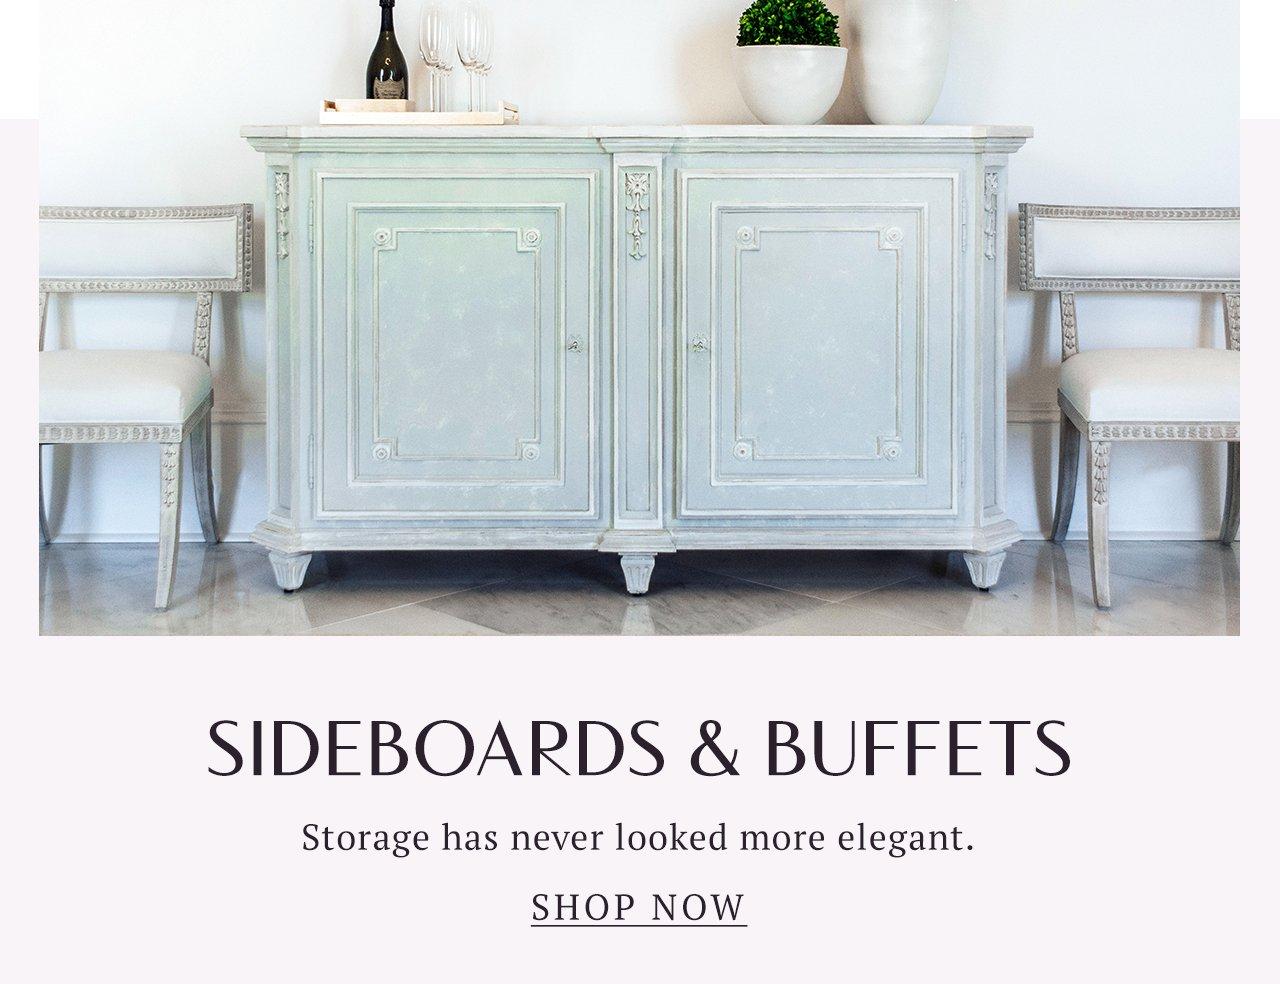 Sideboards + Buffets